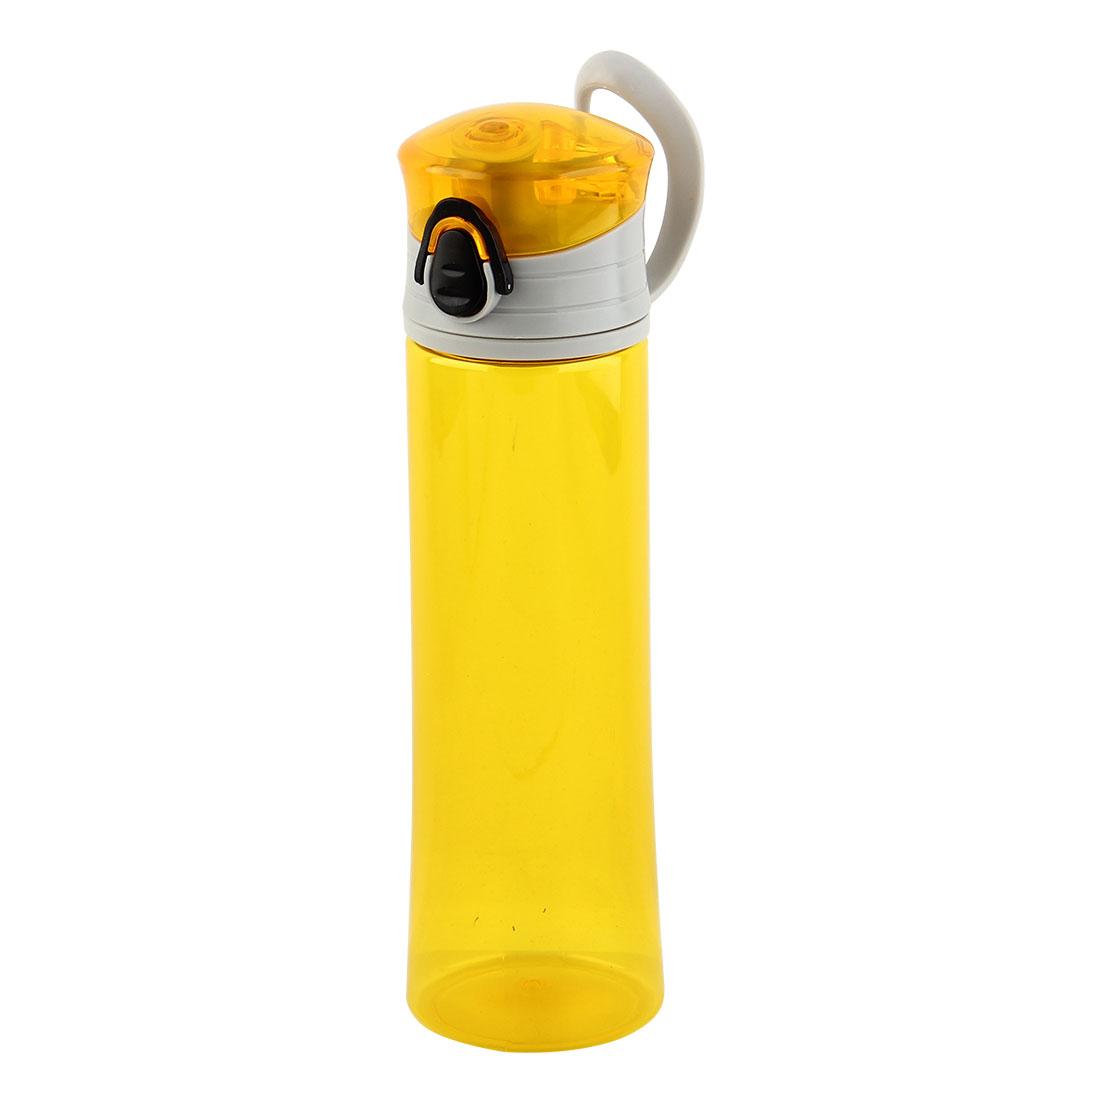 Plastic Portable Water Bottle Fruit Juice Mug Biking Driving Canteen Travelling Hiking Kettle Yellow 400ml